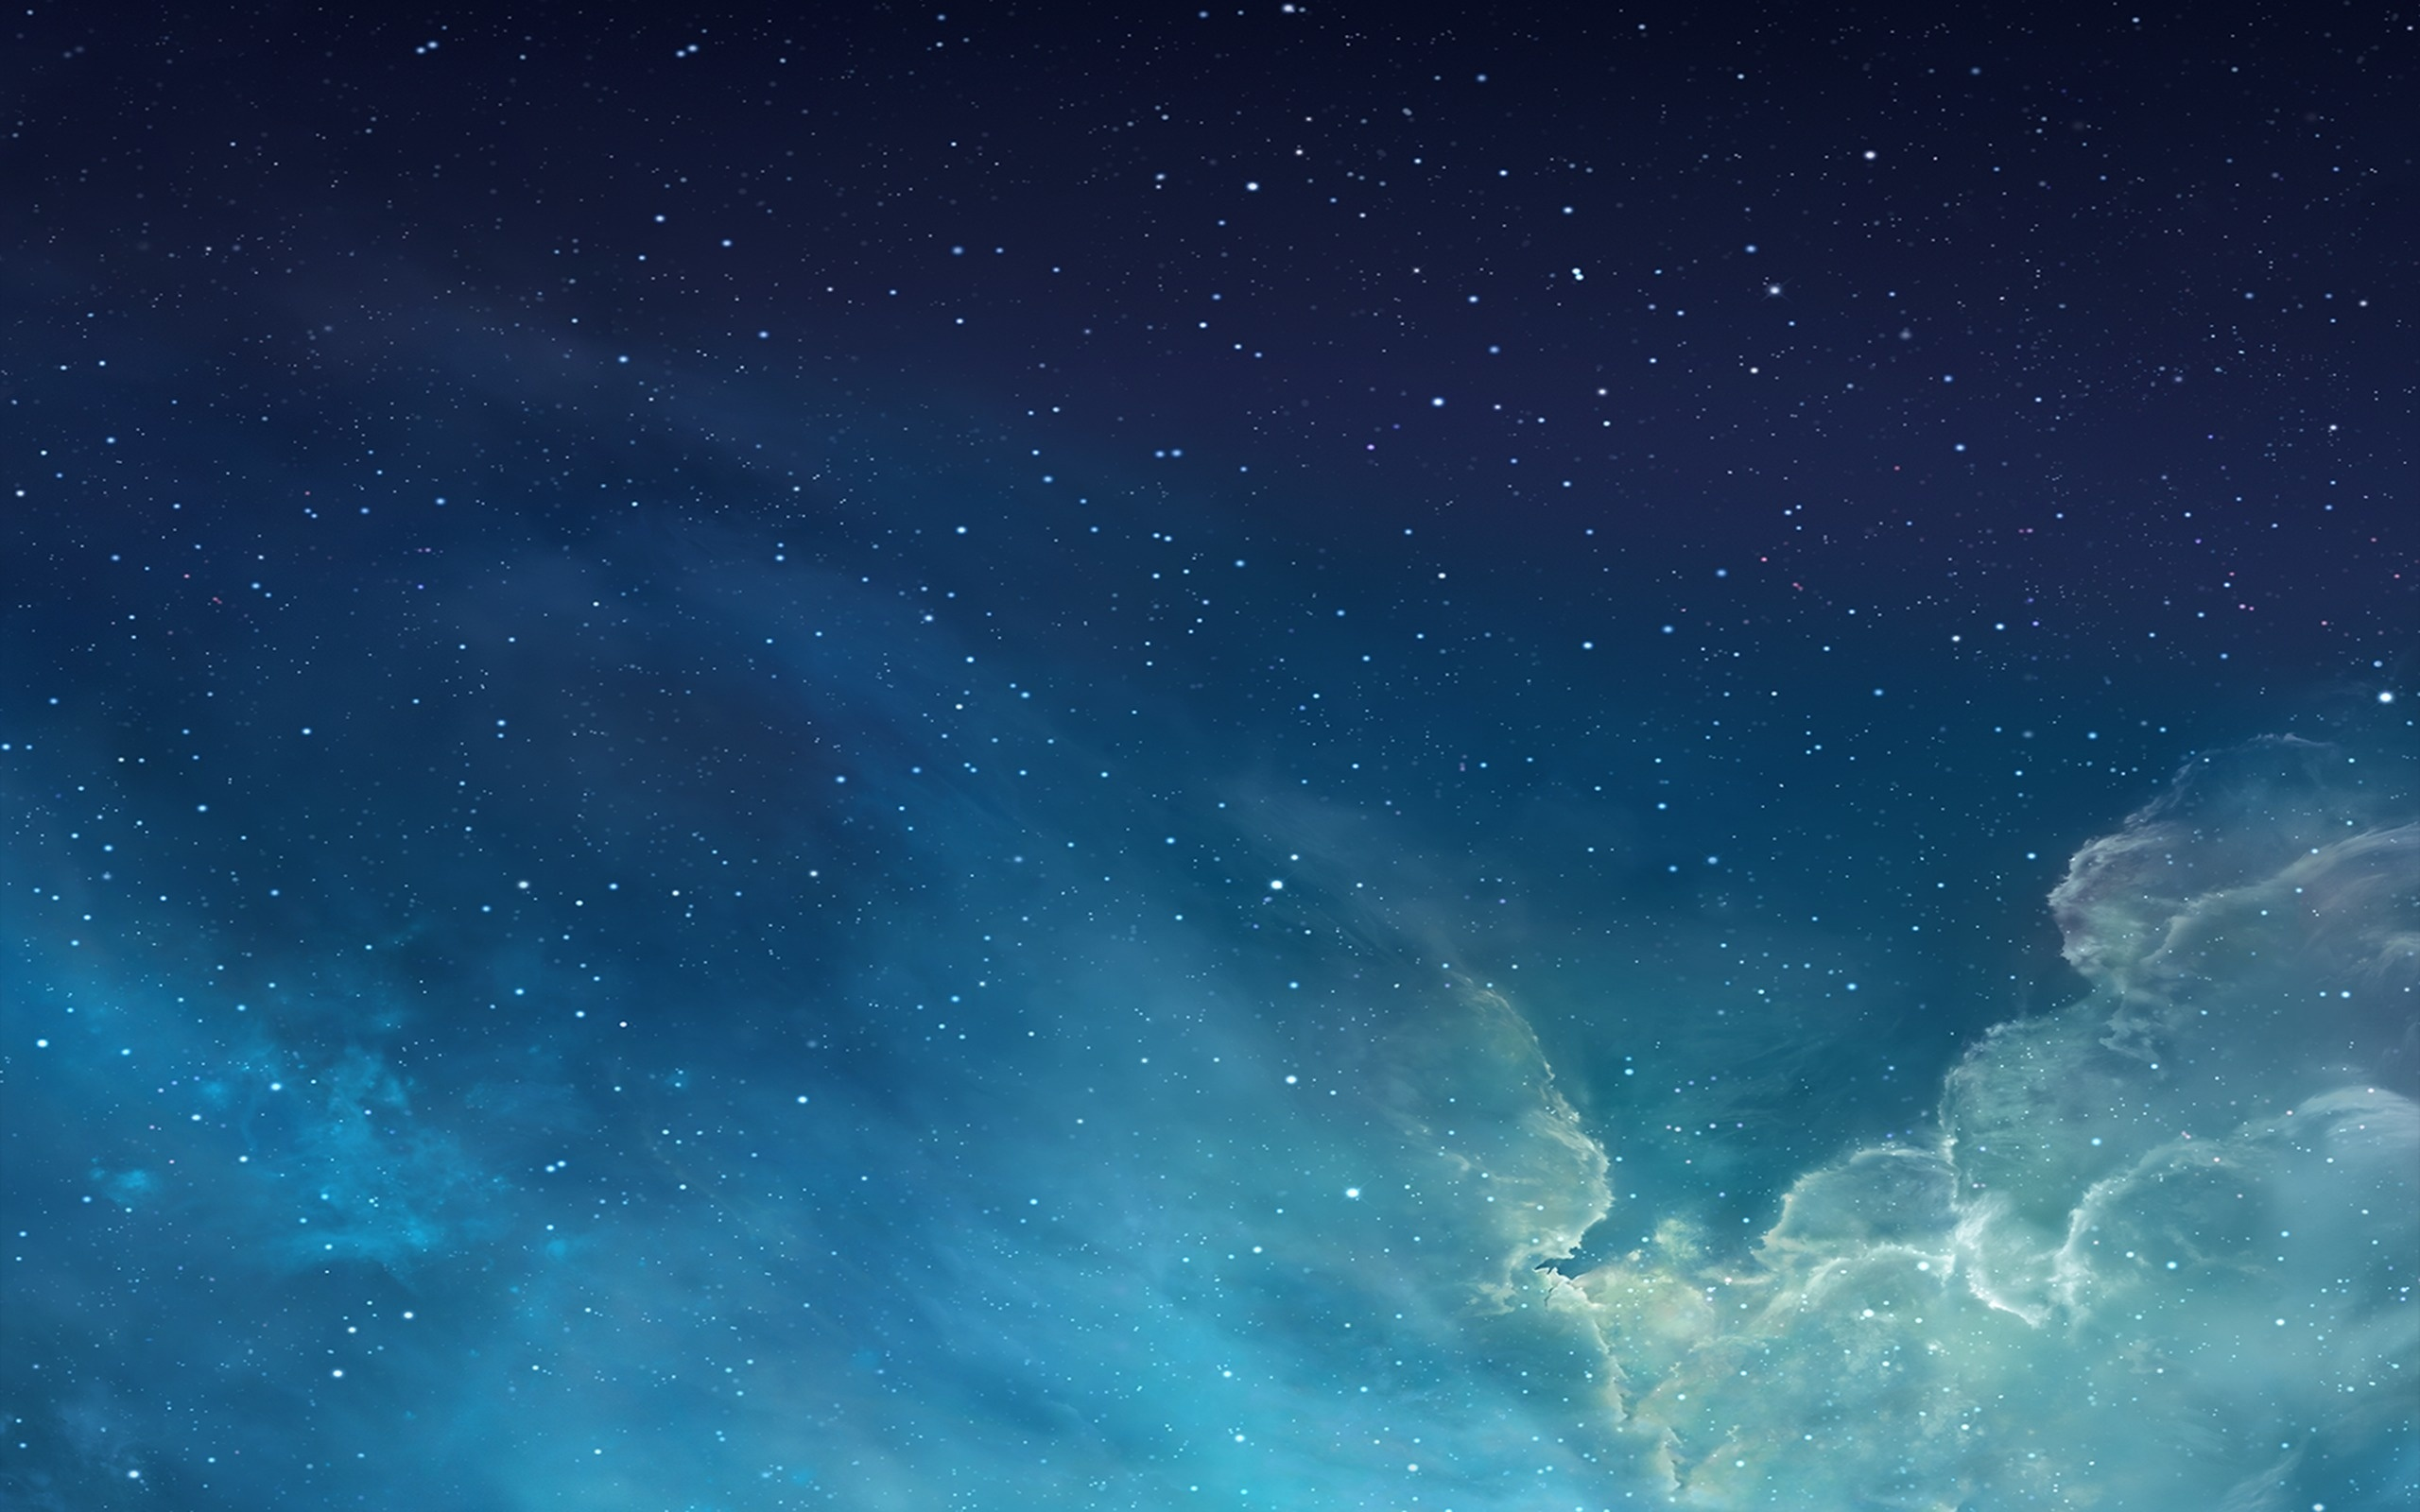 stars clouds nebula space wallpaper 2560x1600 228385 WallpaperUP 2560x1600